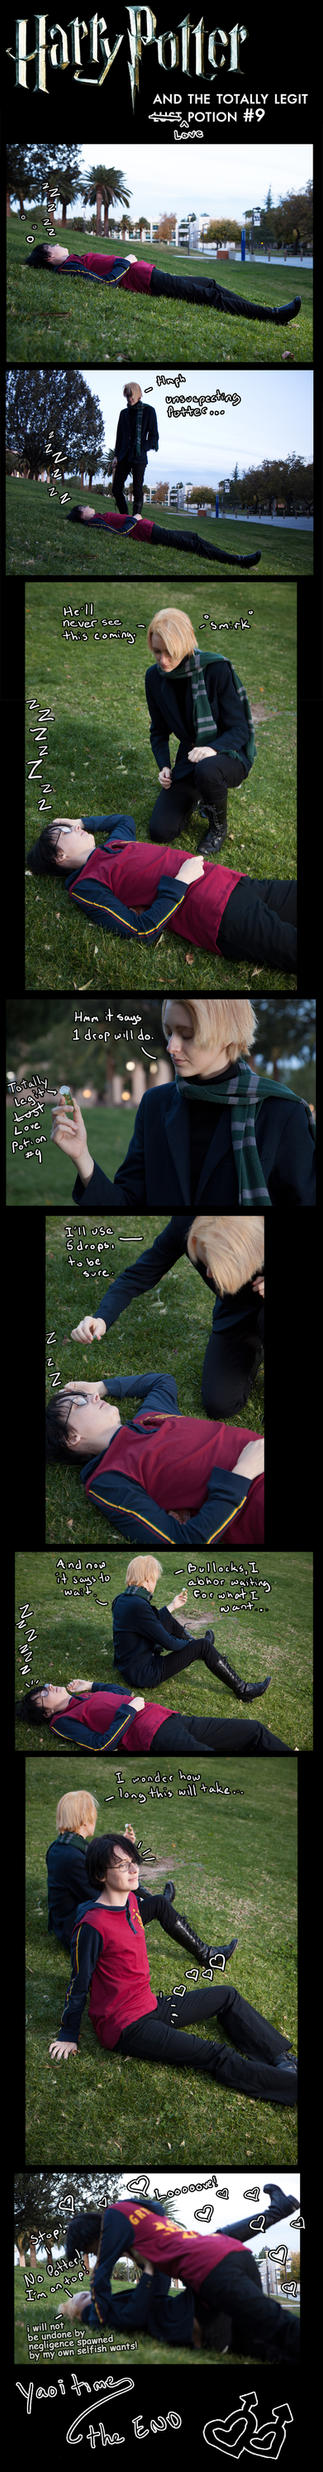 Harry Potter Love Potion by TheSinisterLove